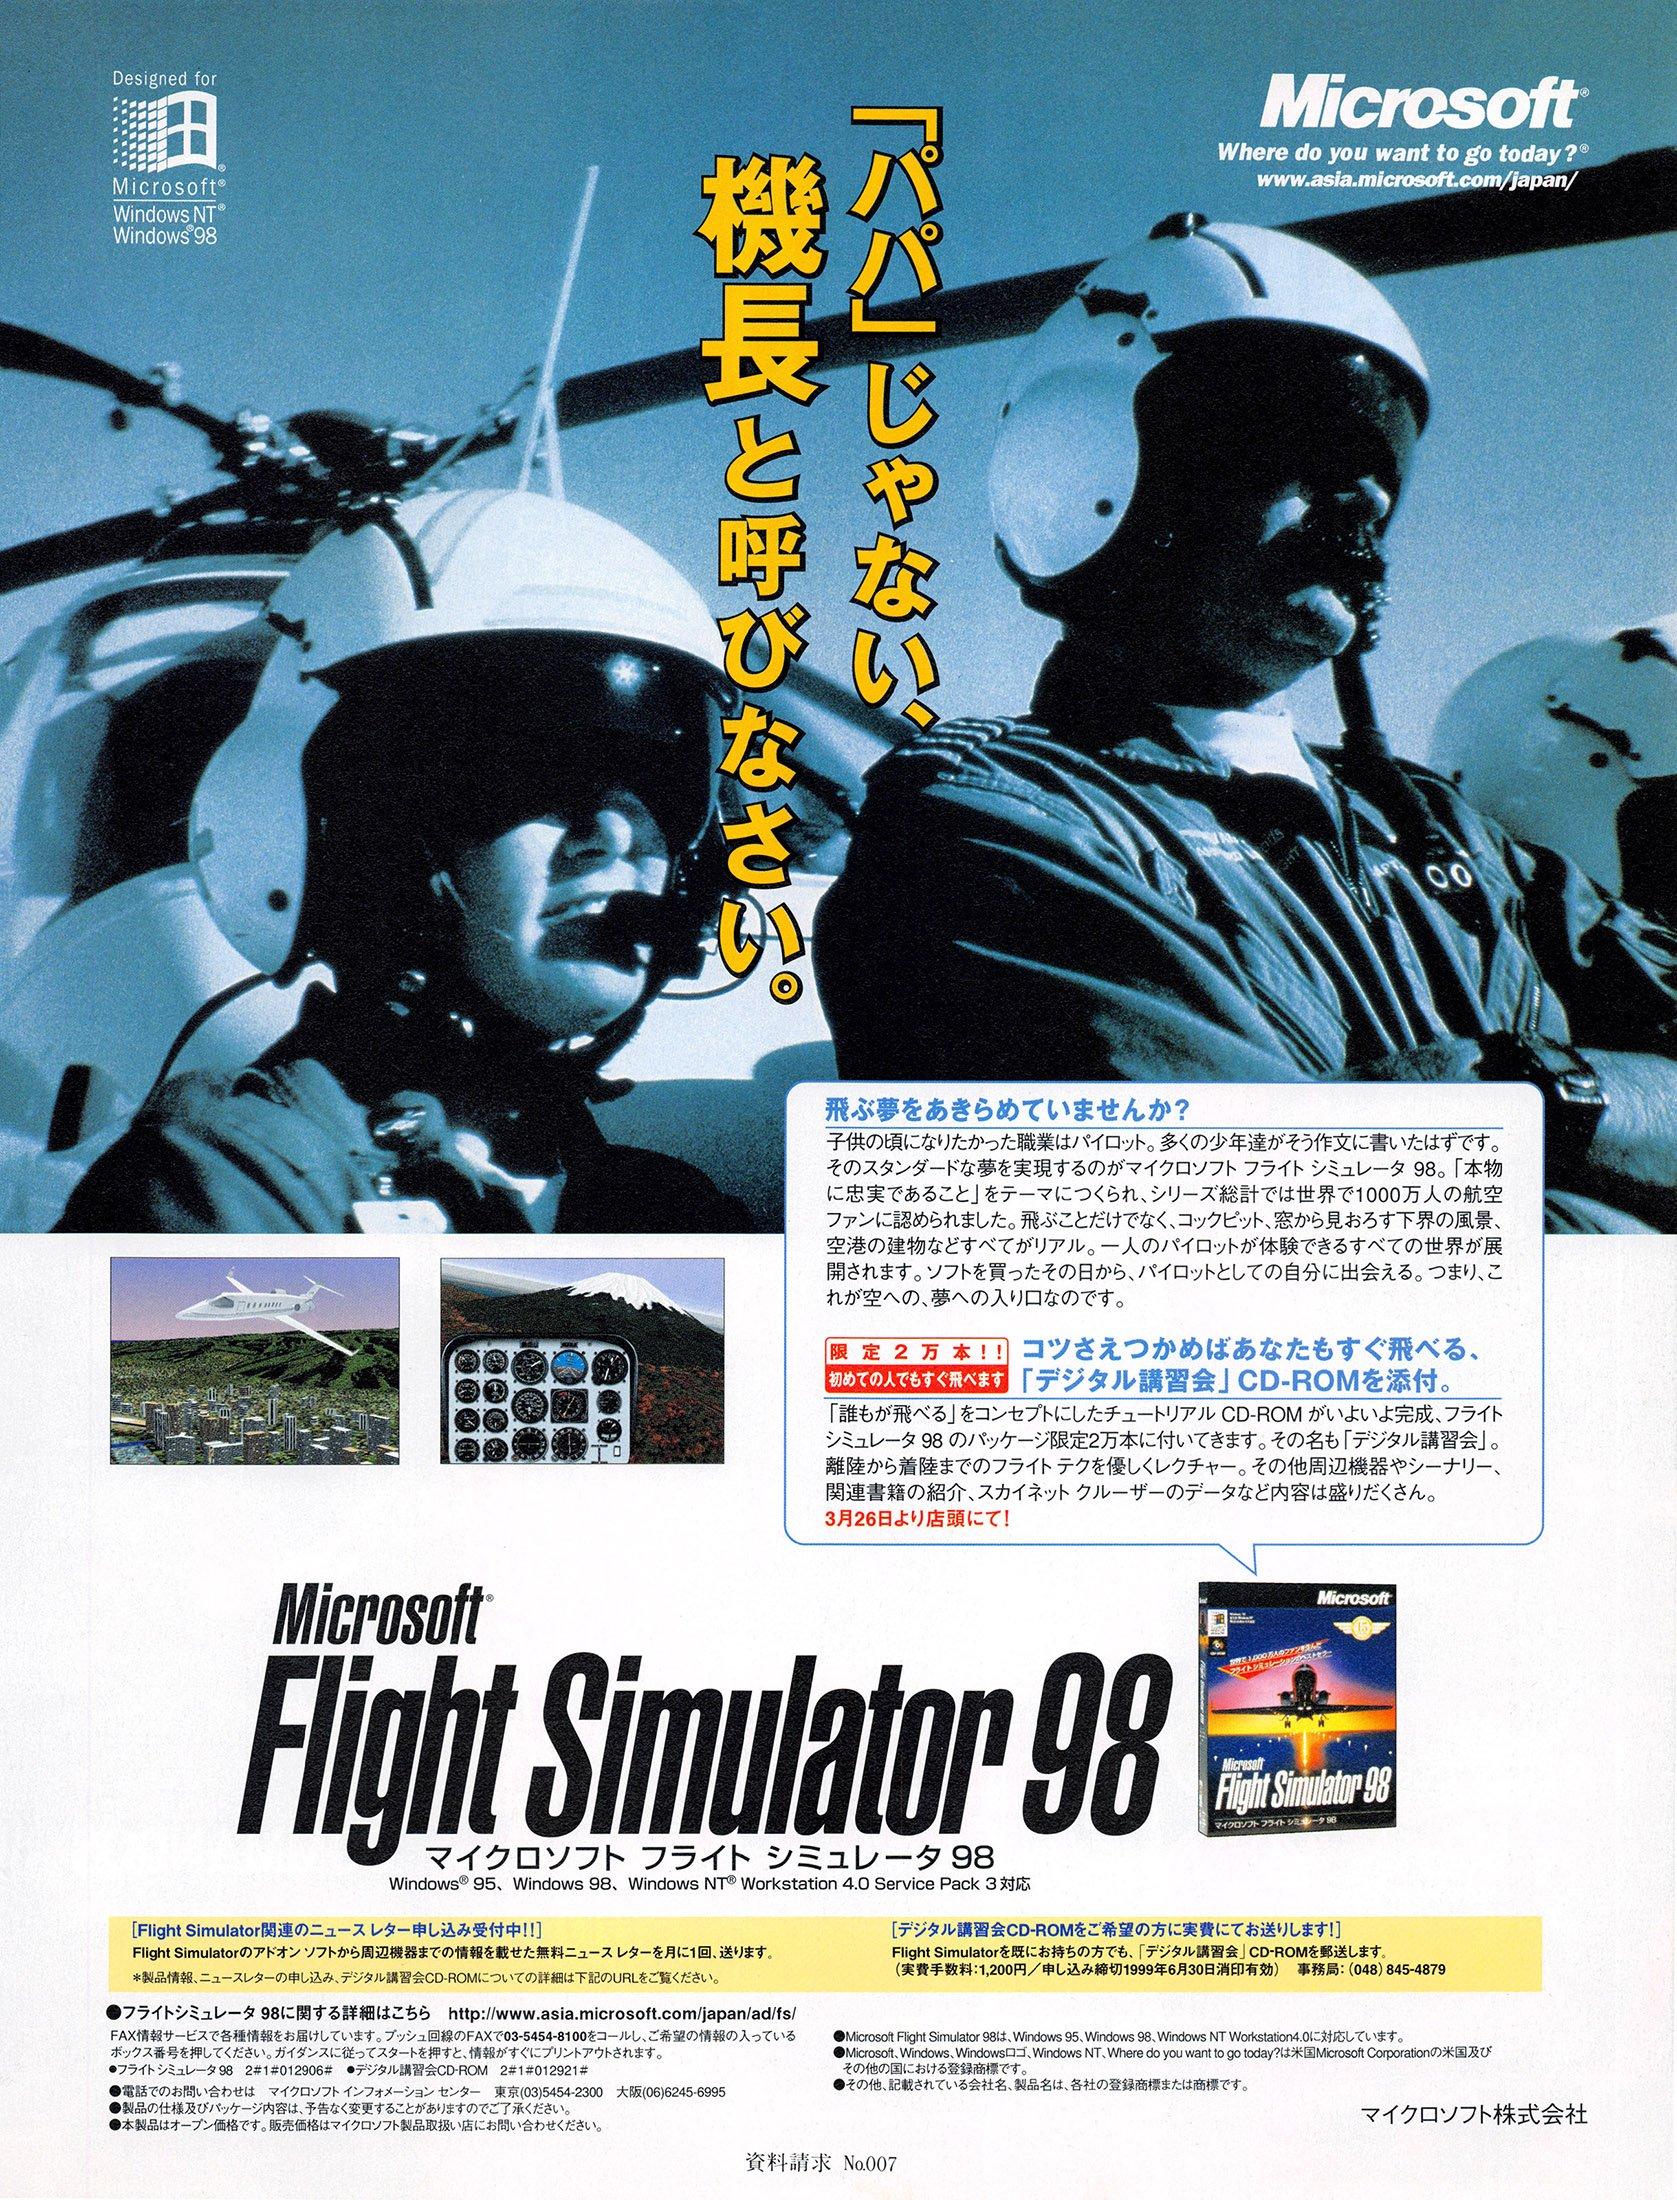 Microsoft Flight Simulator 98 (Japan)